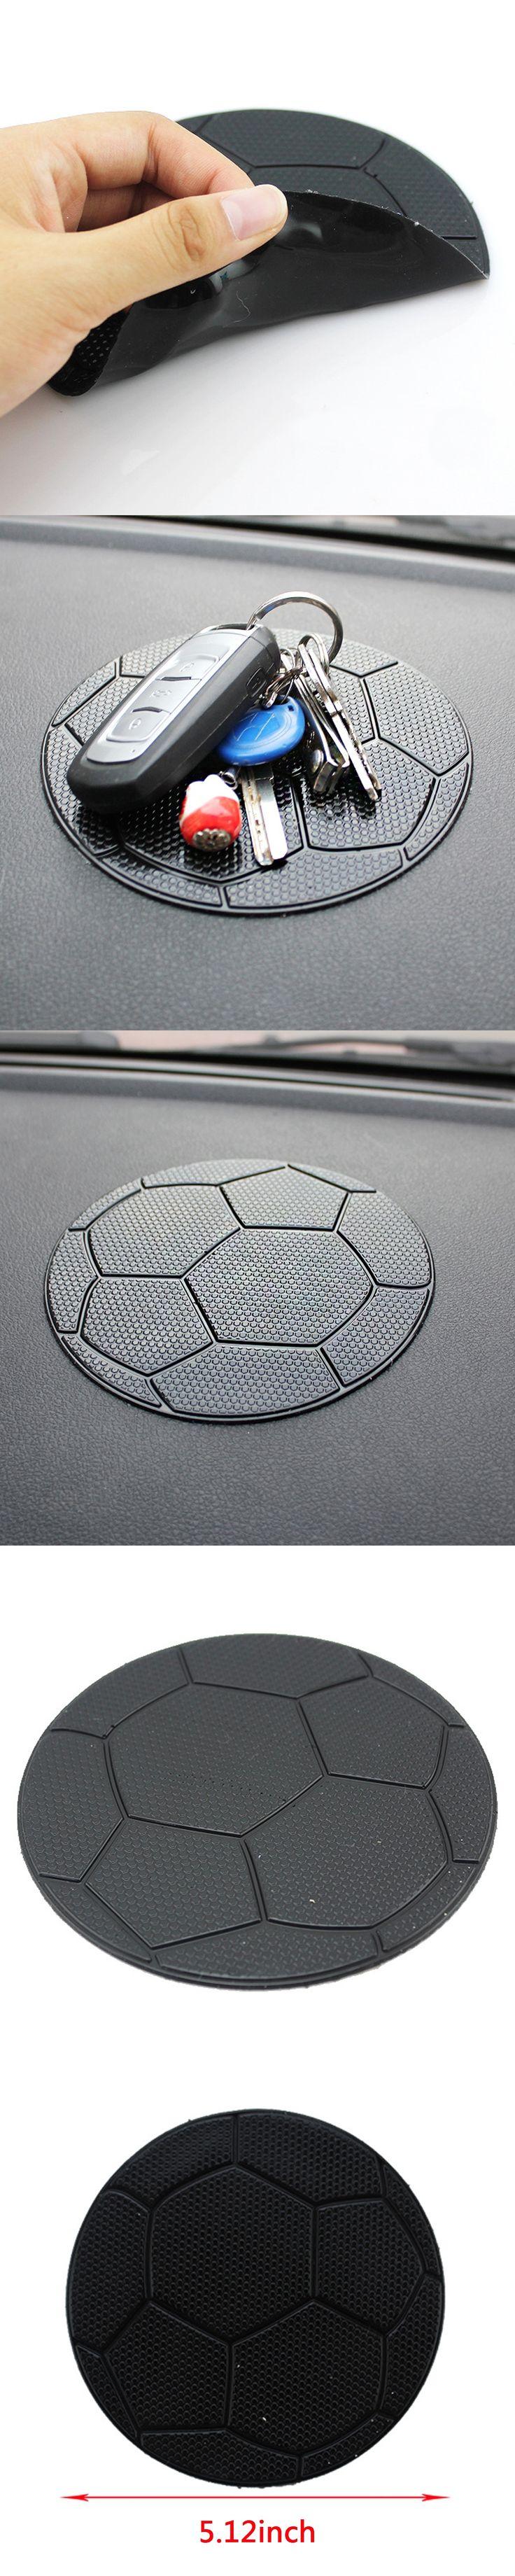 Dewtreetali 1pc Black Interior Car Football Anti-Slip Dashboard Sticky For Pad Non-slip Mat Holder GPS Cell Phone Key Holder